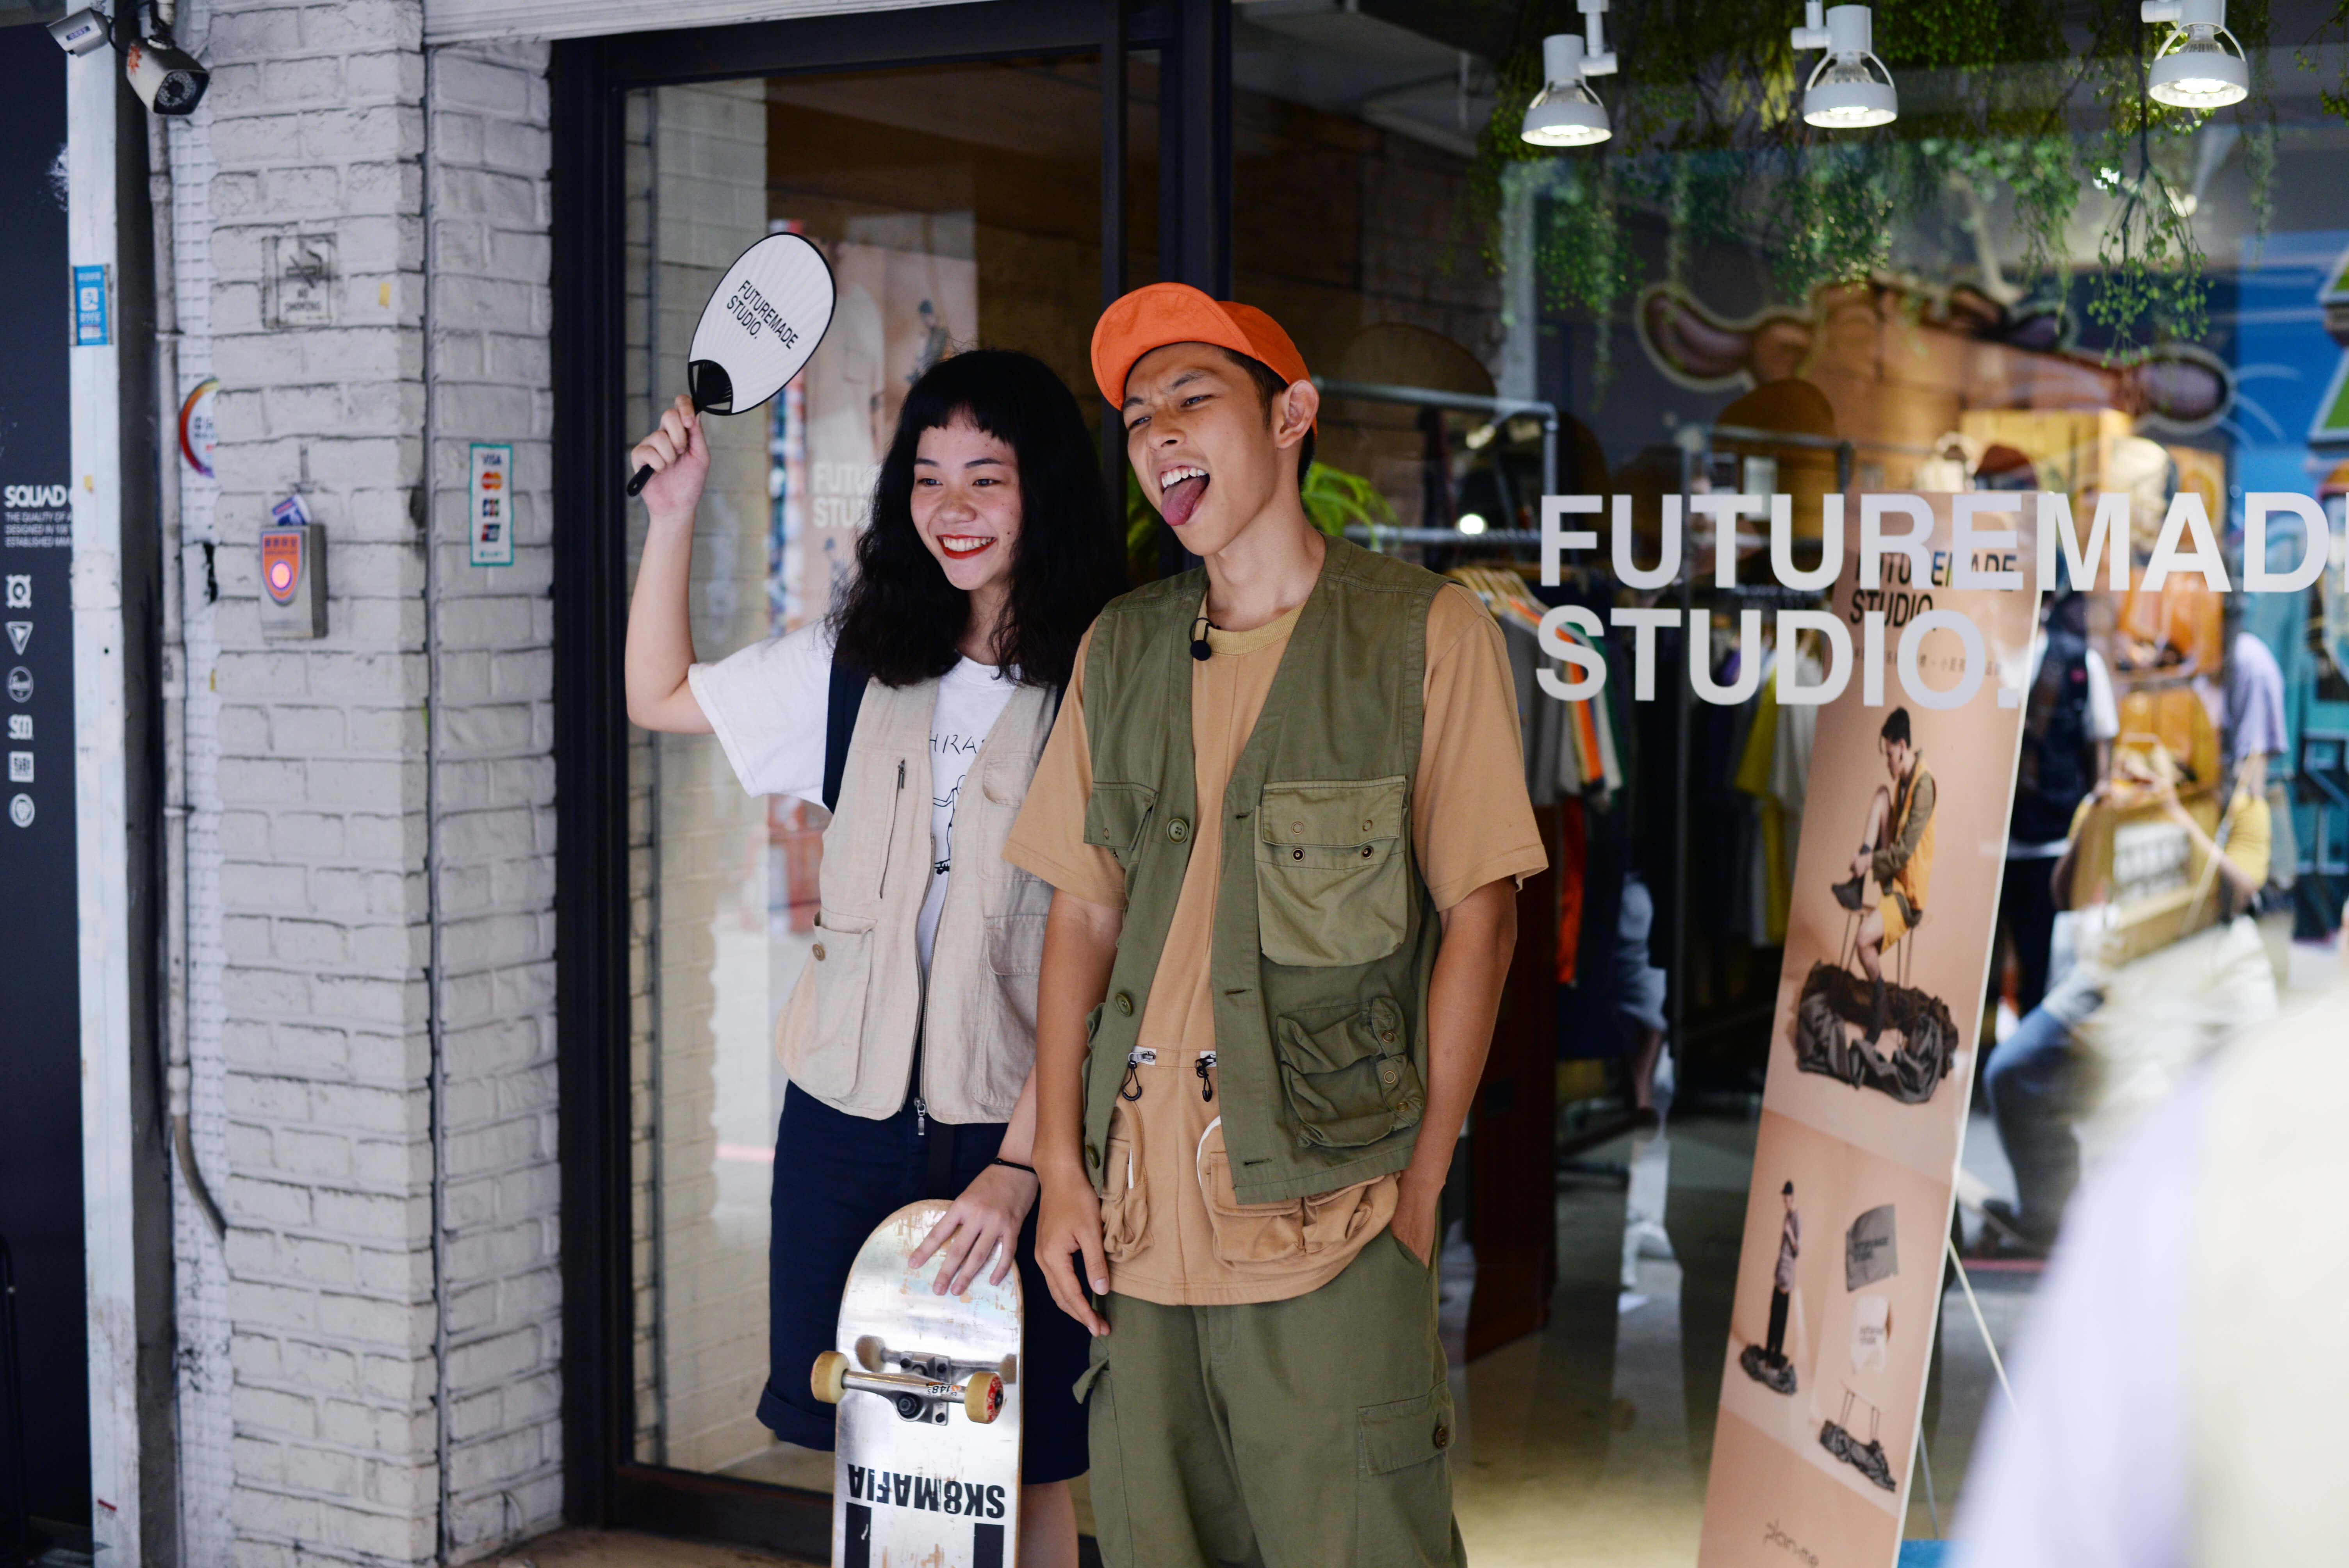 Futuremade,小屁孩,XiaoPiHai,球鞋開箱,youtuber,球鞋,FUTUREMADE STUDIO